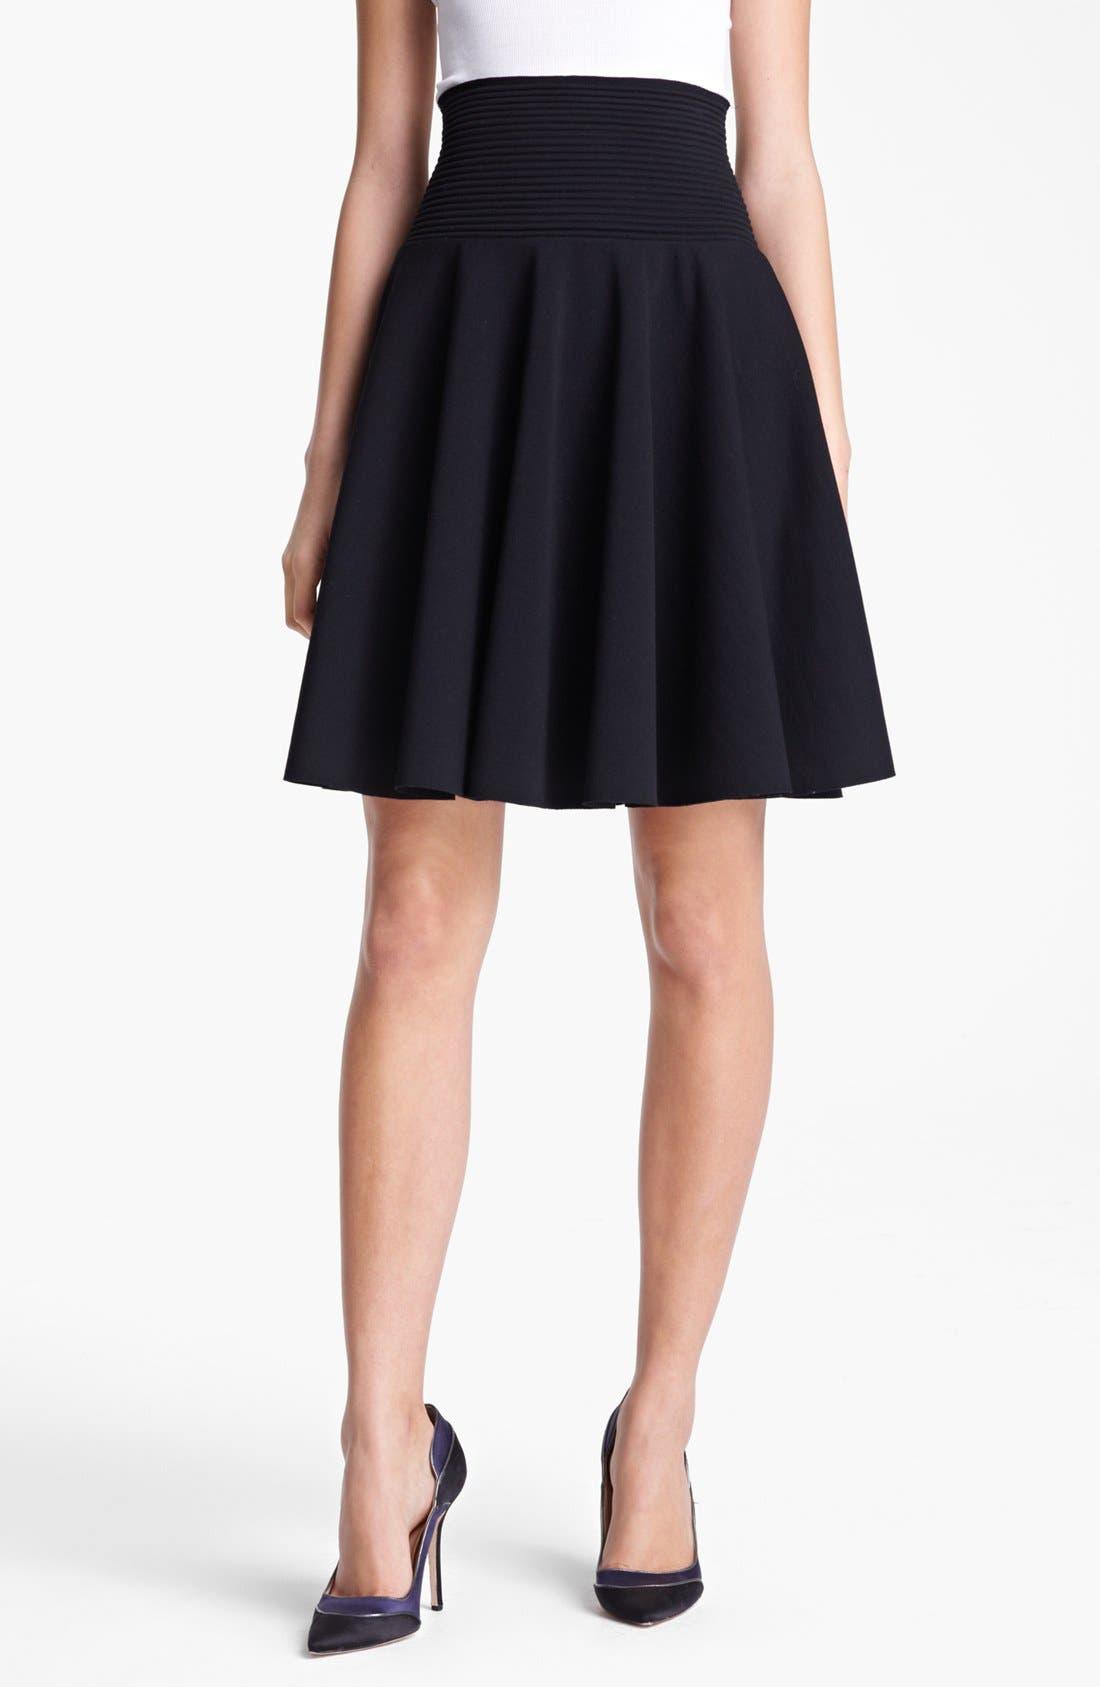 Alternate Image 1 Selected - Oscar de la Renta Flared Knit Skirt